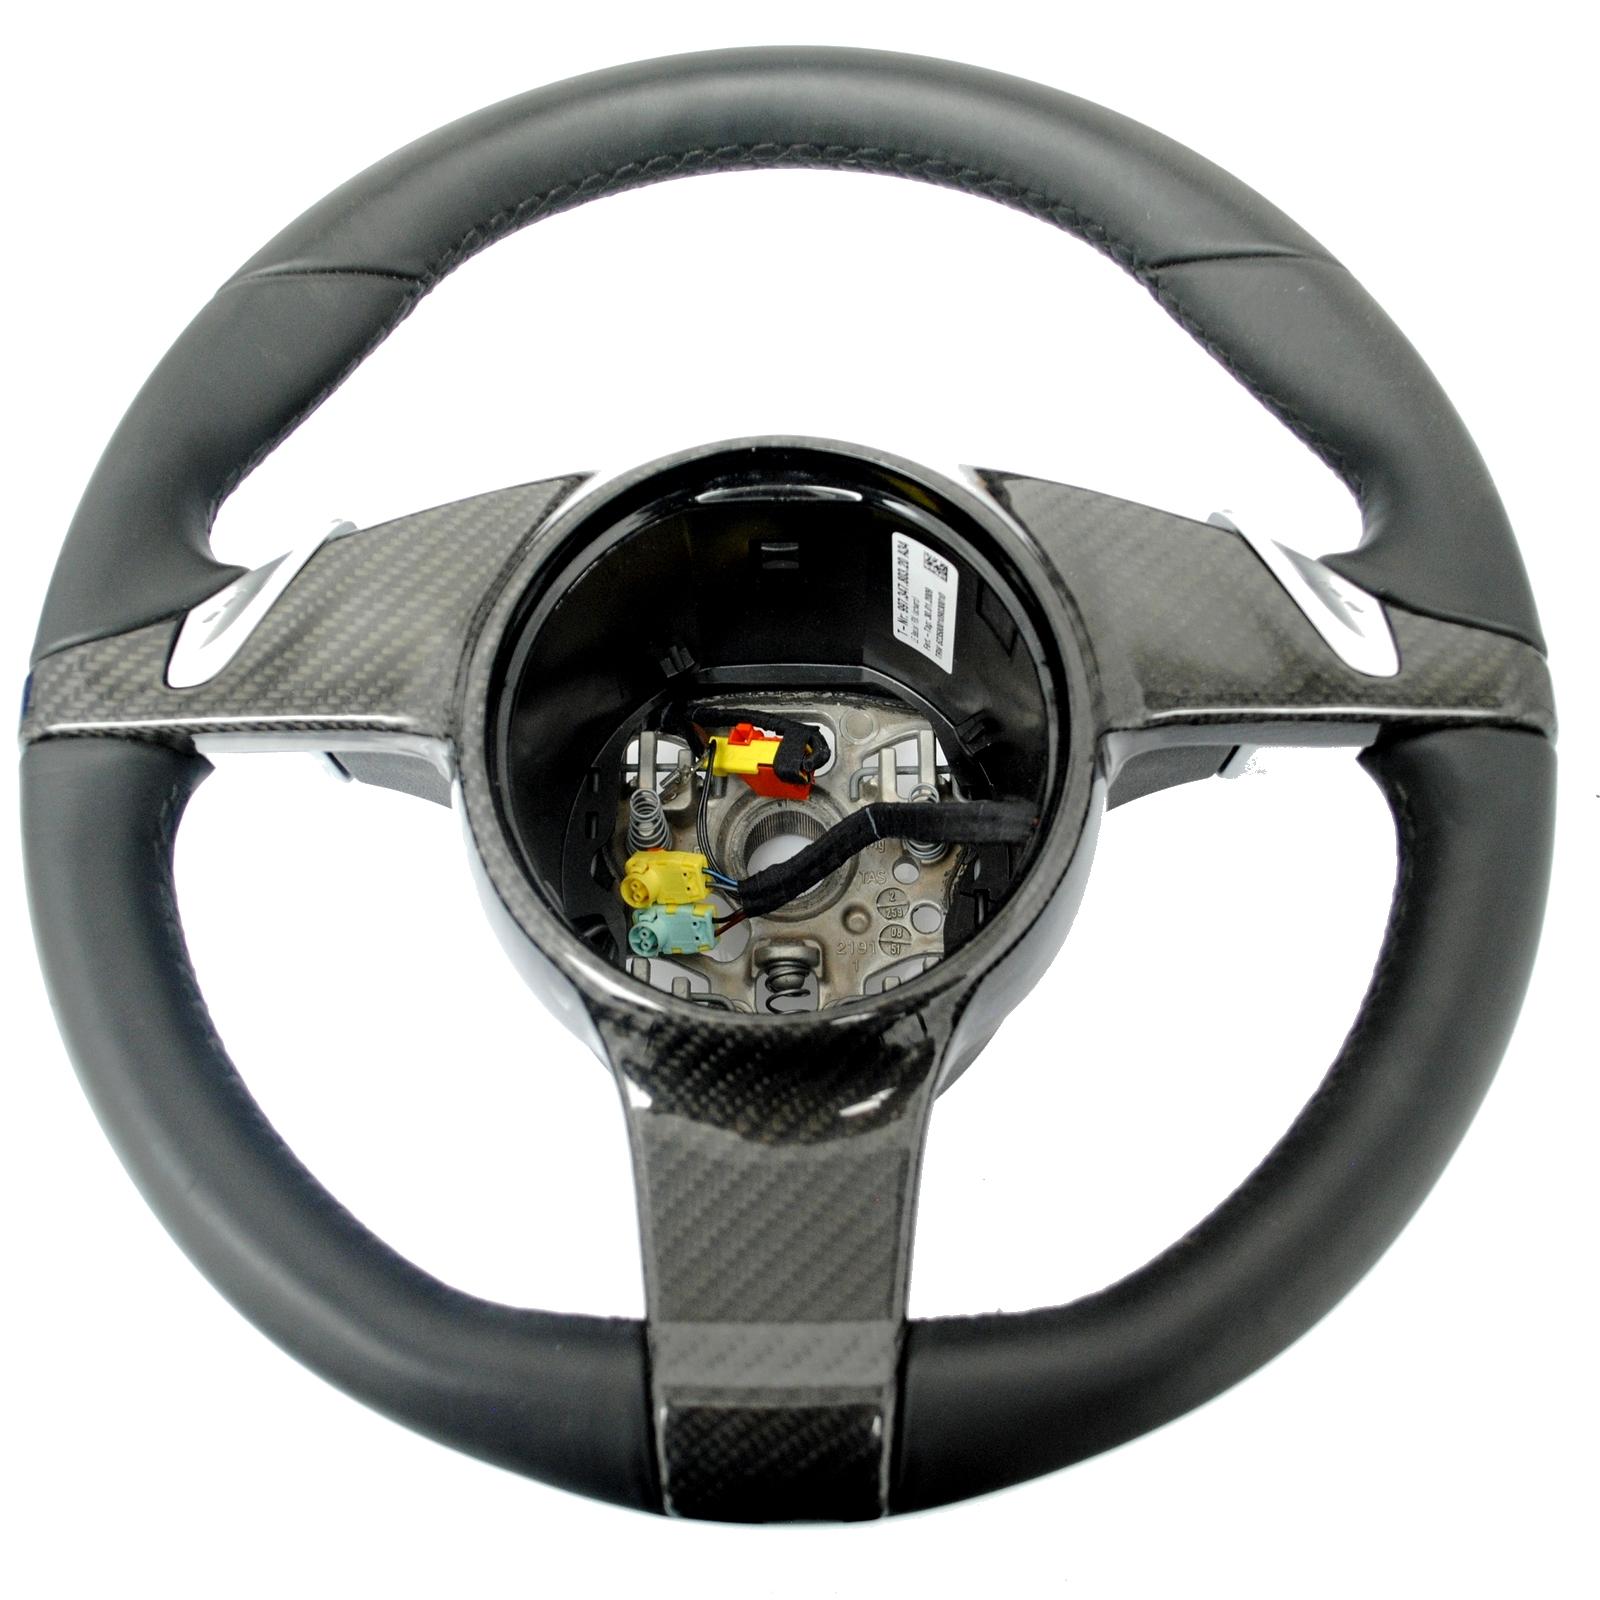 porsche 911 987 997 cayman lenkrad mit carbon abdeckung. Black Bedroom Furniture Sets. Home Design Ideas